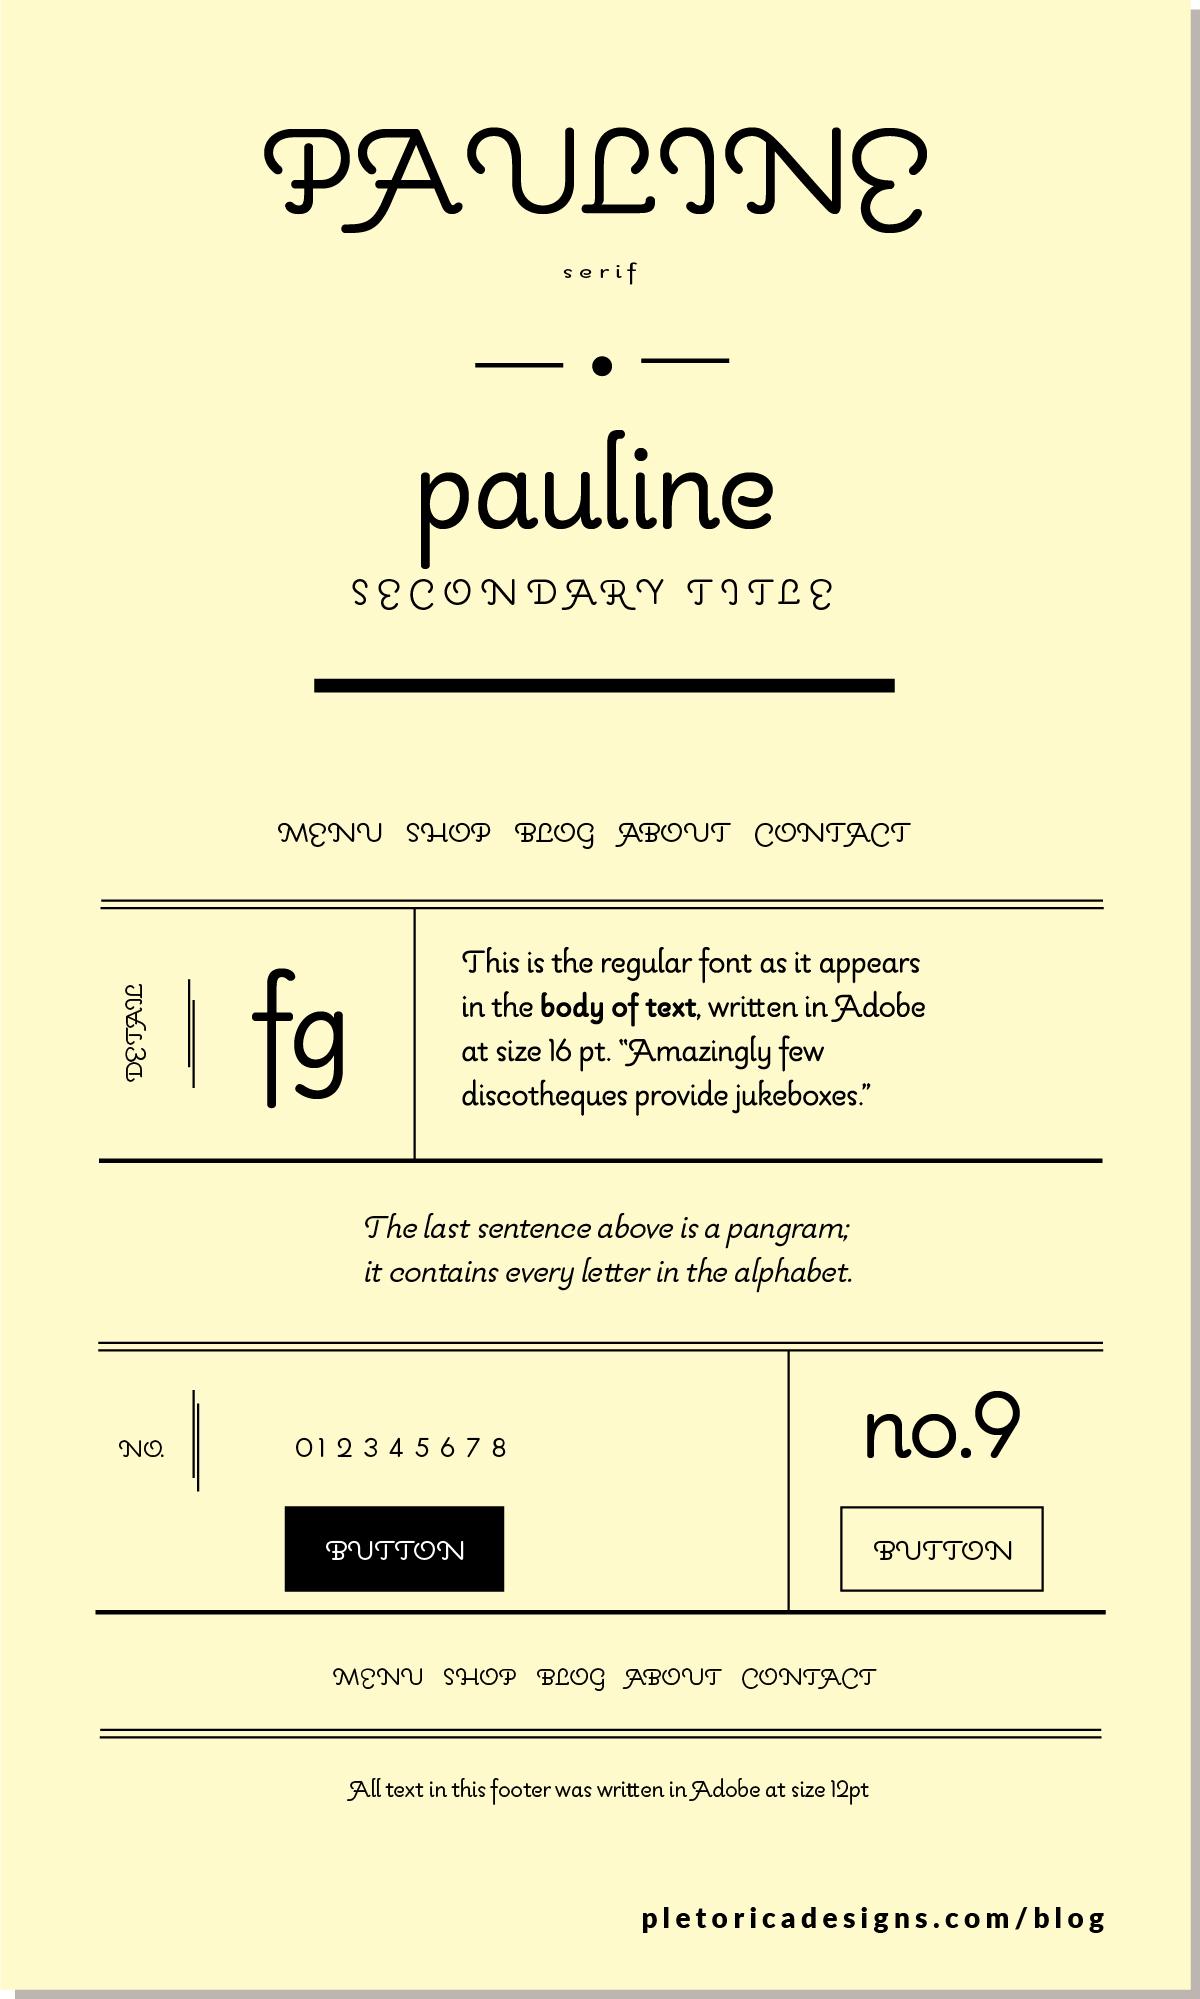 LET'S TYPE: Pauline — PLETÓRICA DESIGNS